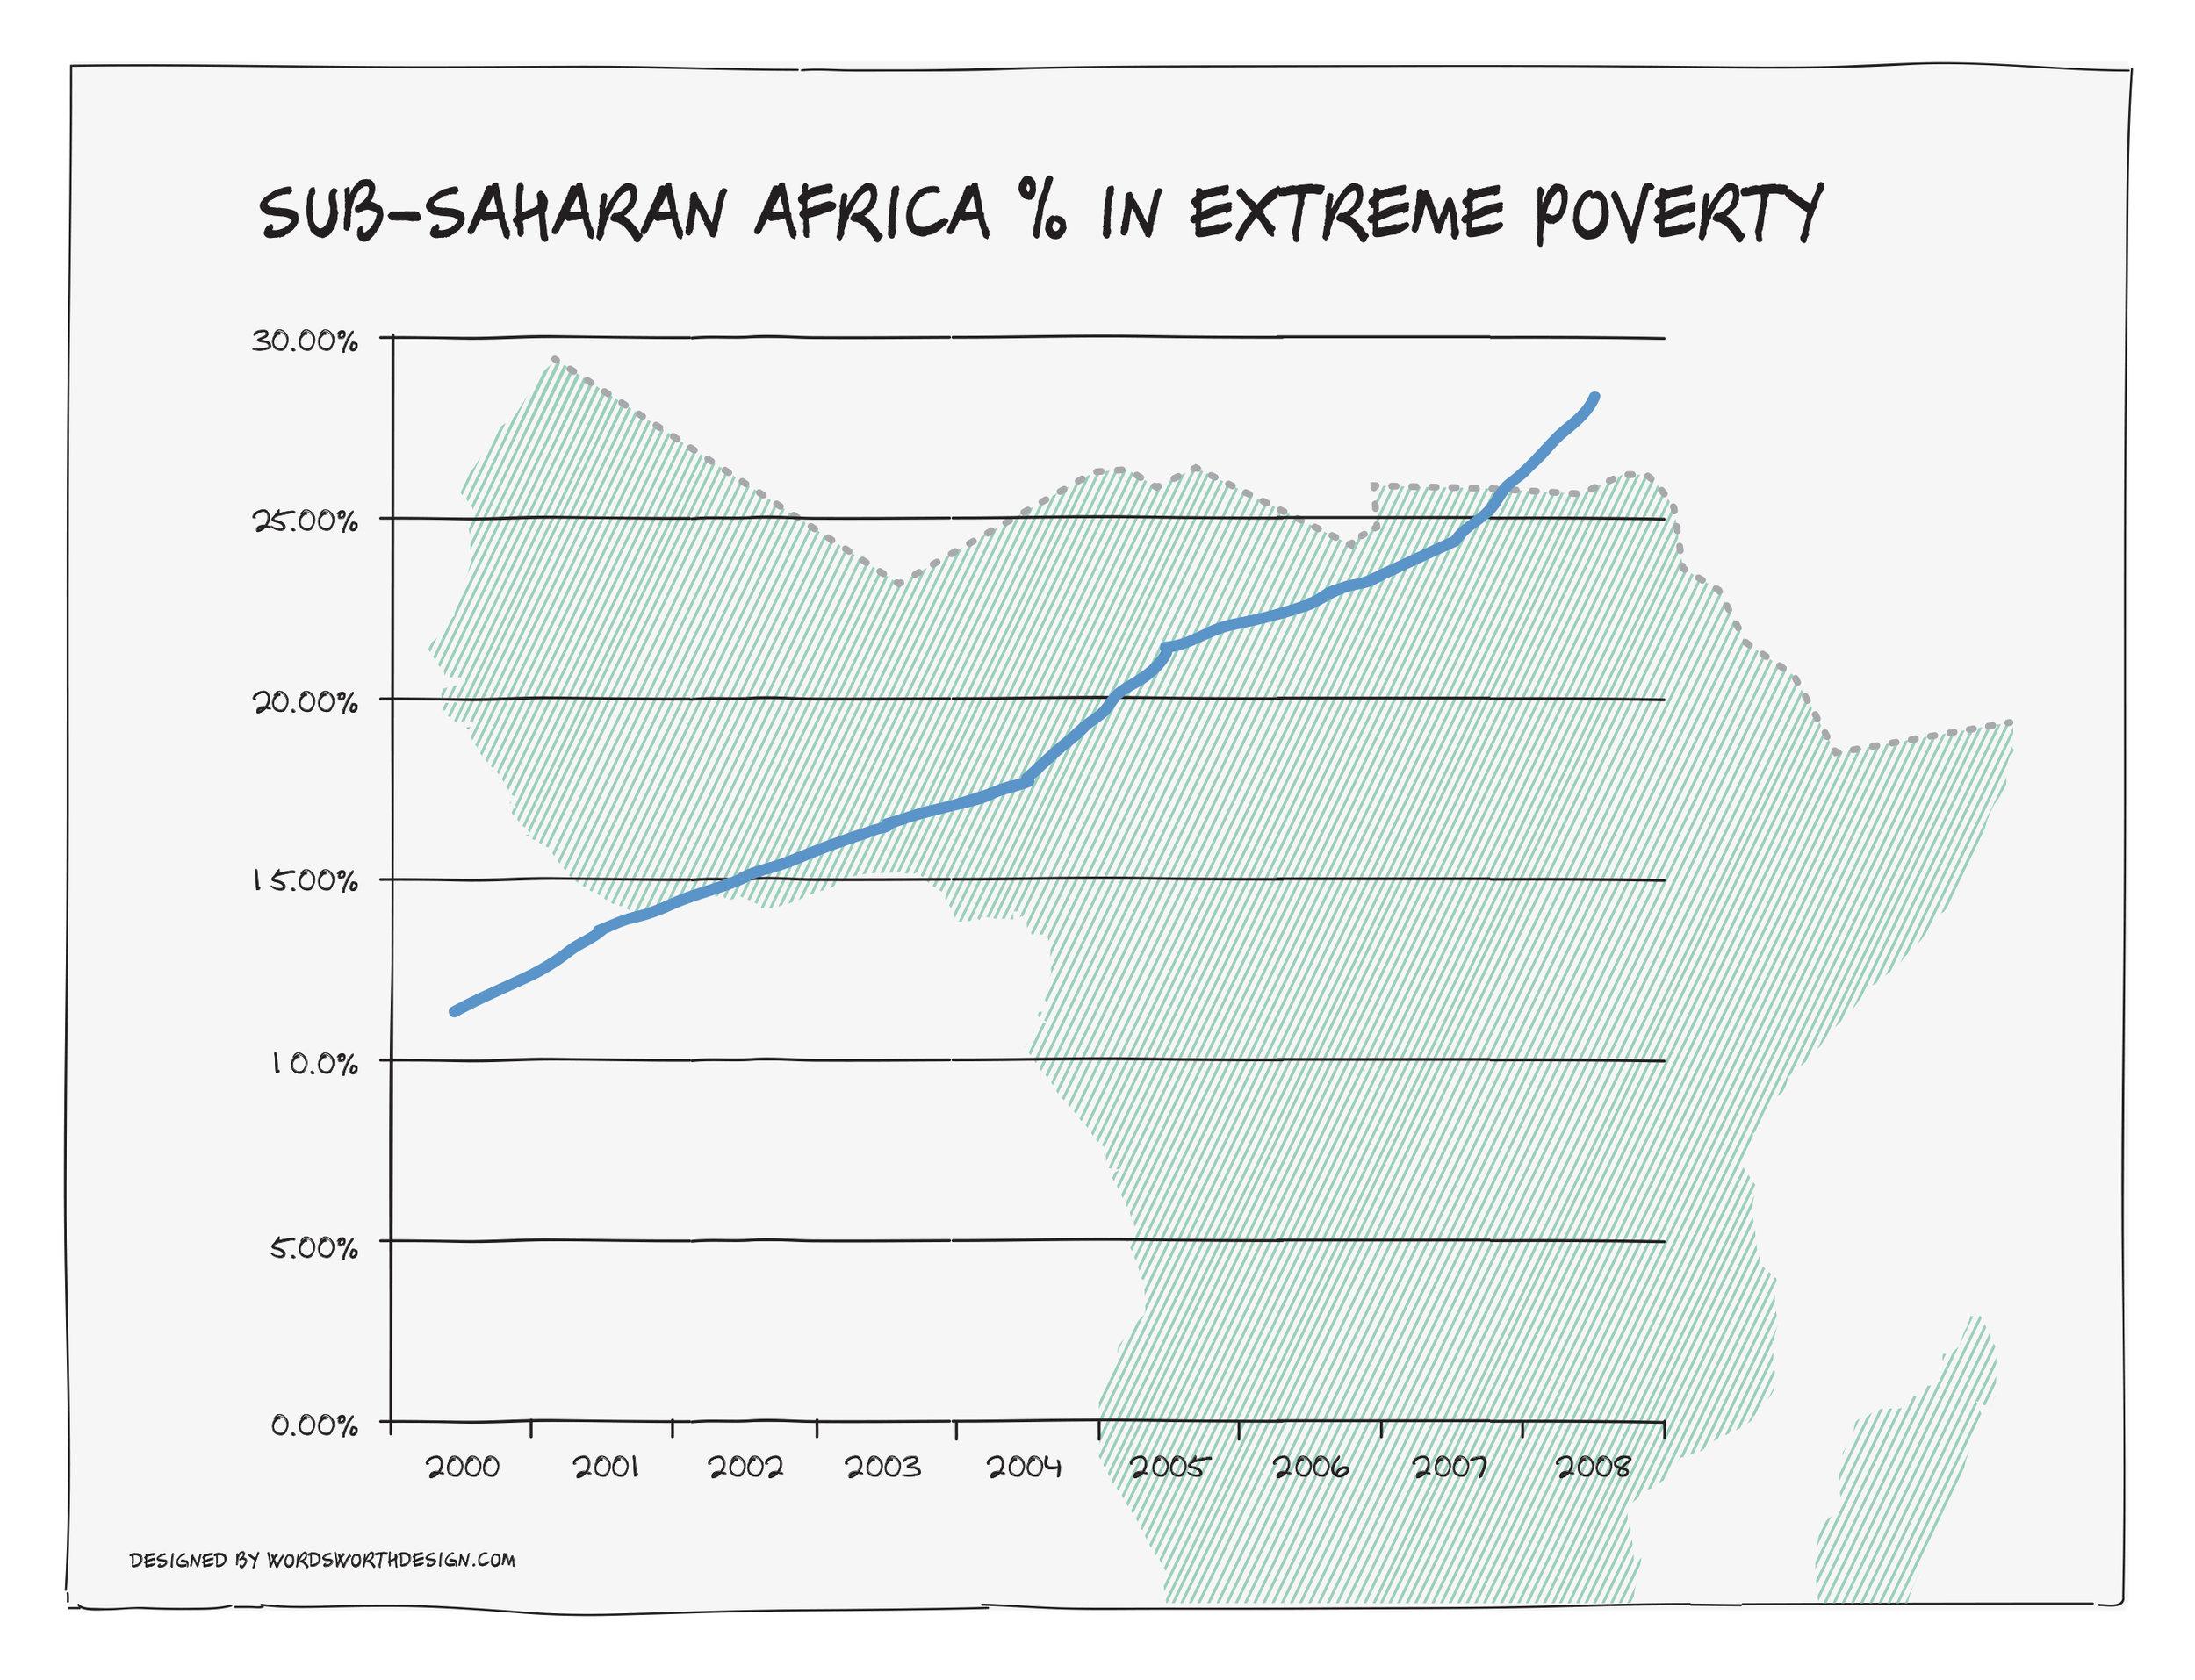 subsaharan_africa_poverty_percent.jpg